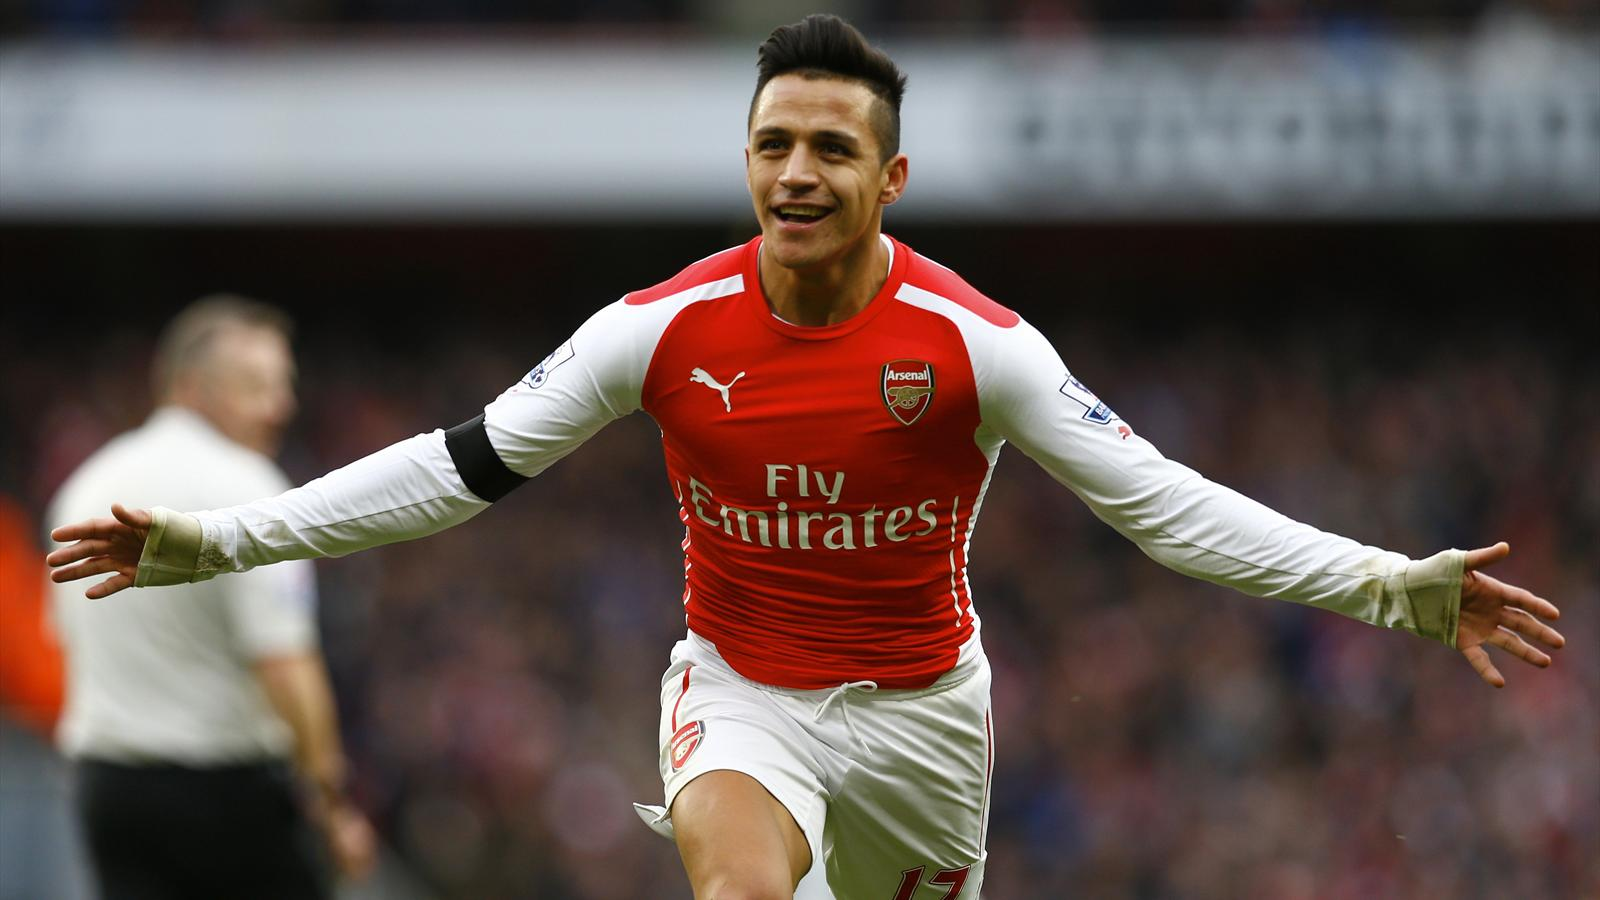 Alexis Sanchez's latest epic contribution inspires Arsenal thumping of Stoke - Premier League ...